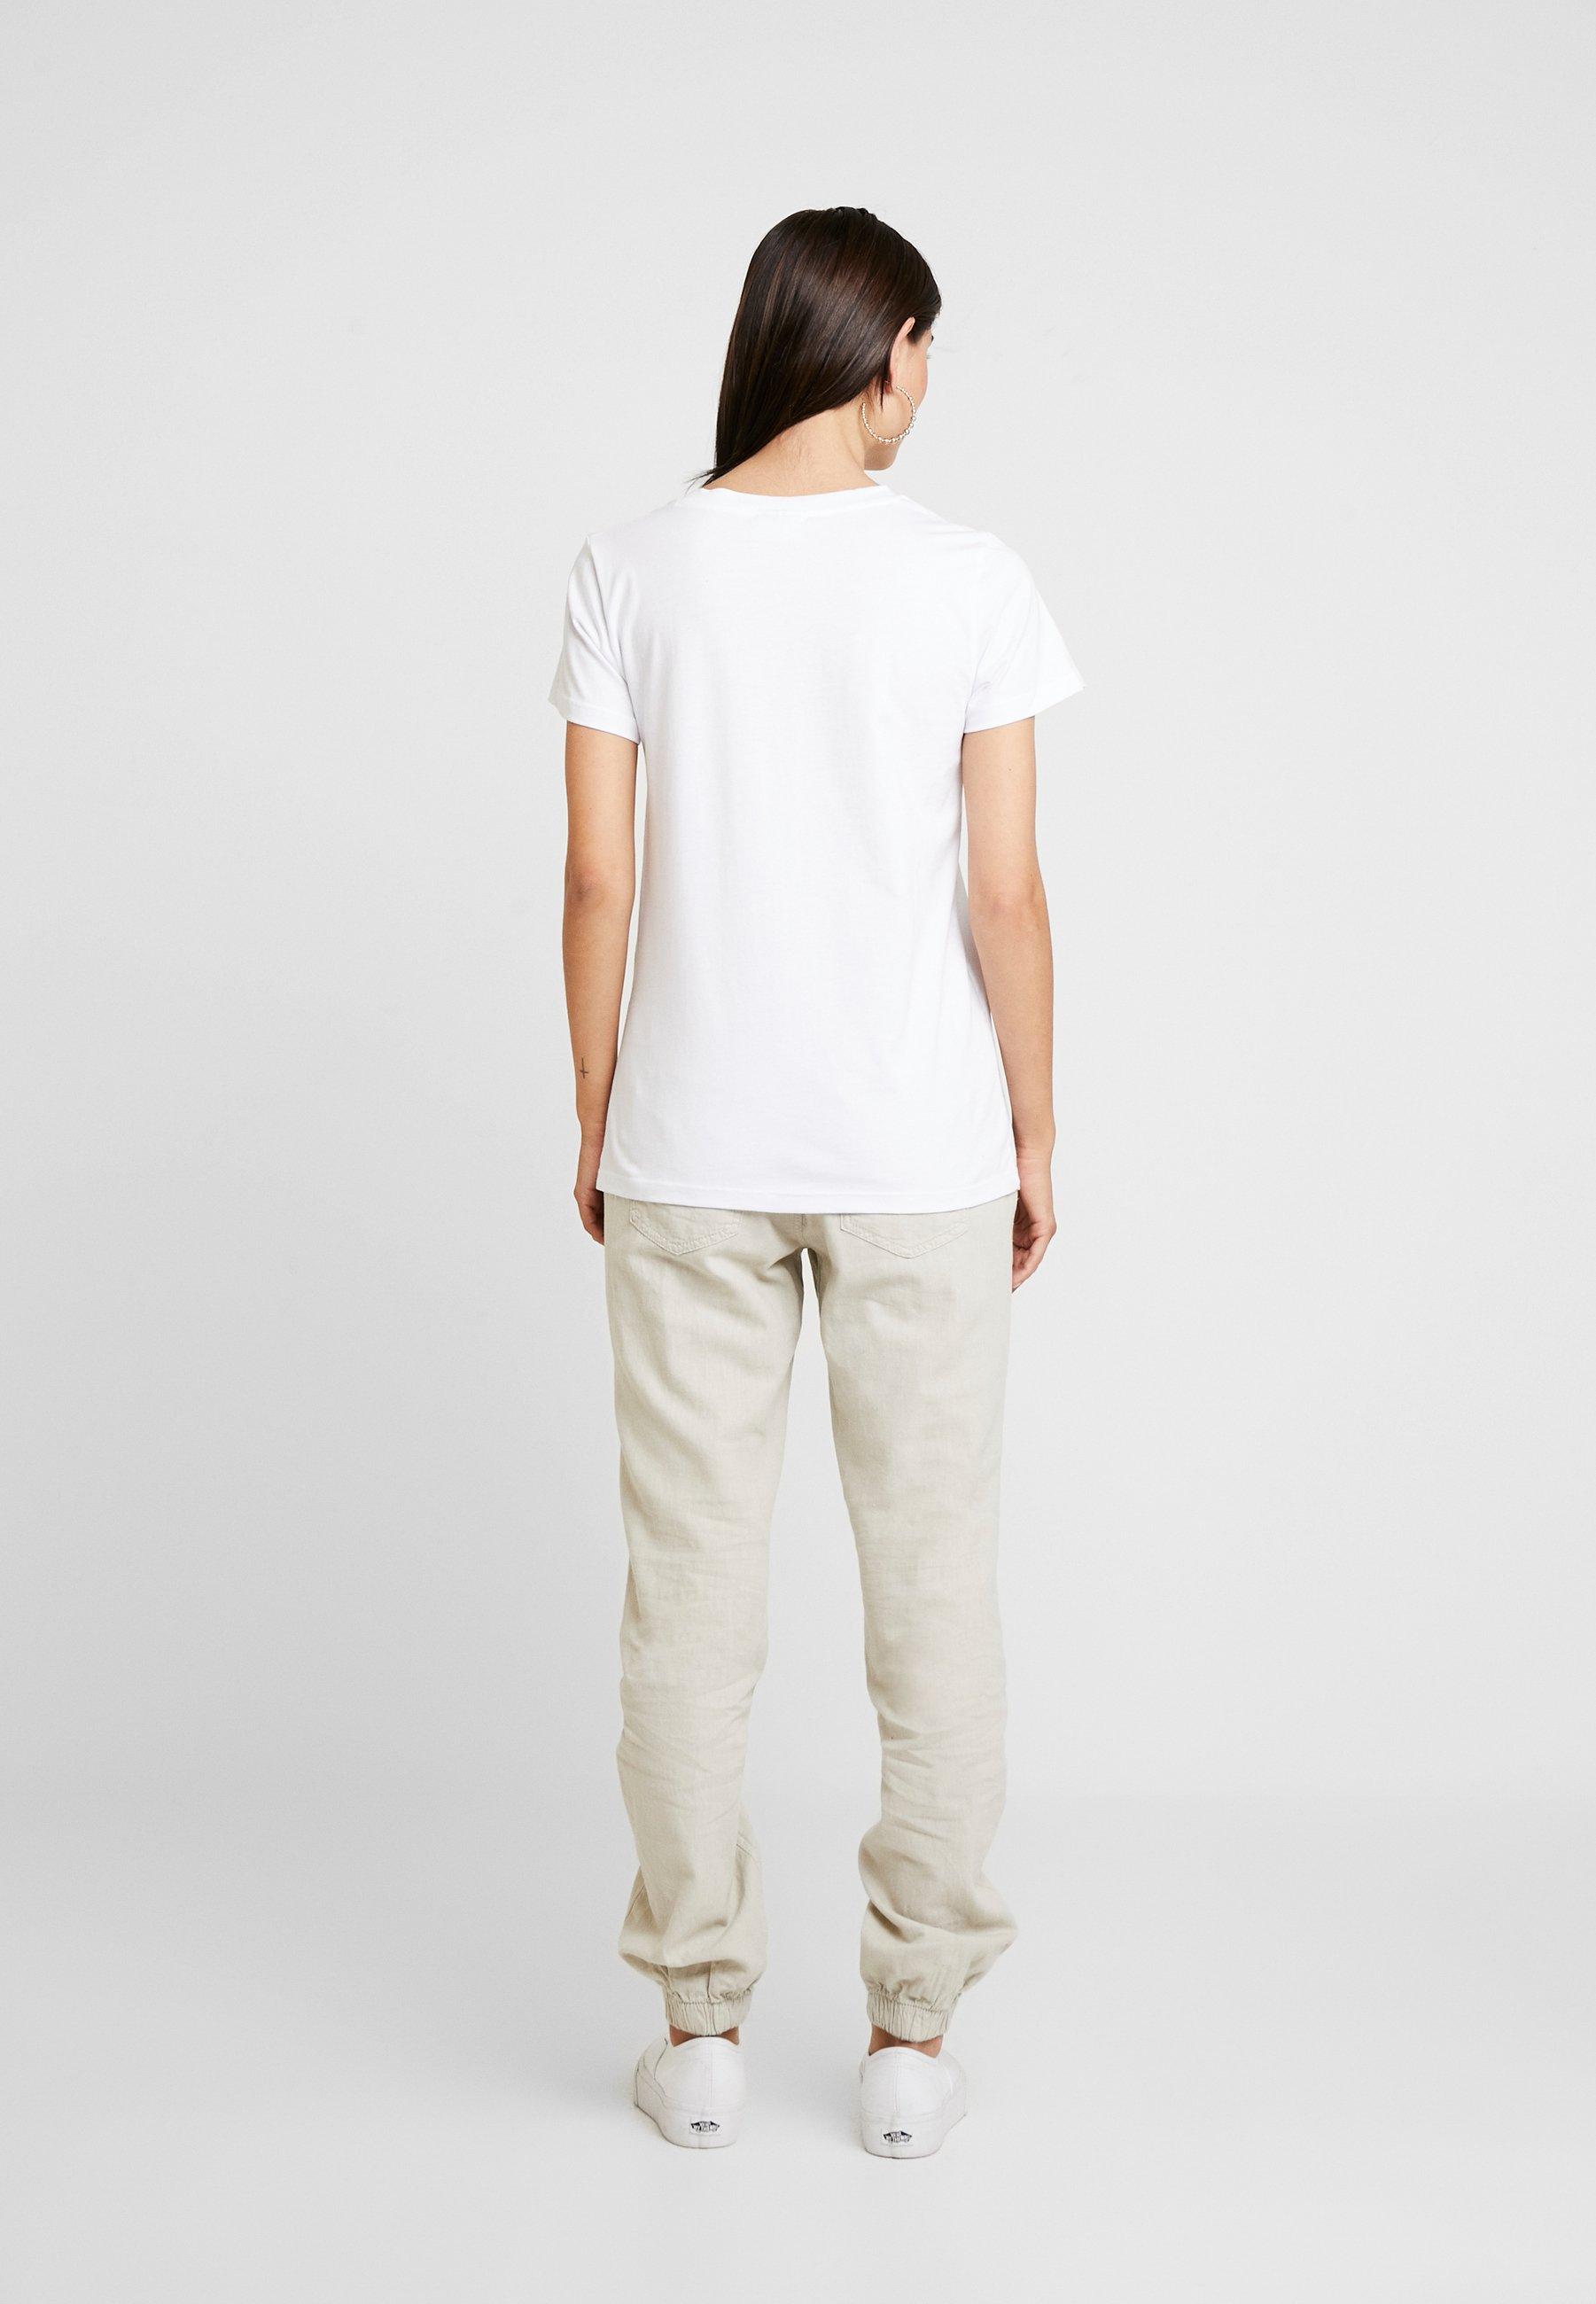 KayesT shirt Imprimé Kaffe Optical White l1TKFJc